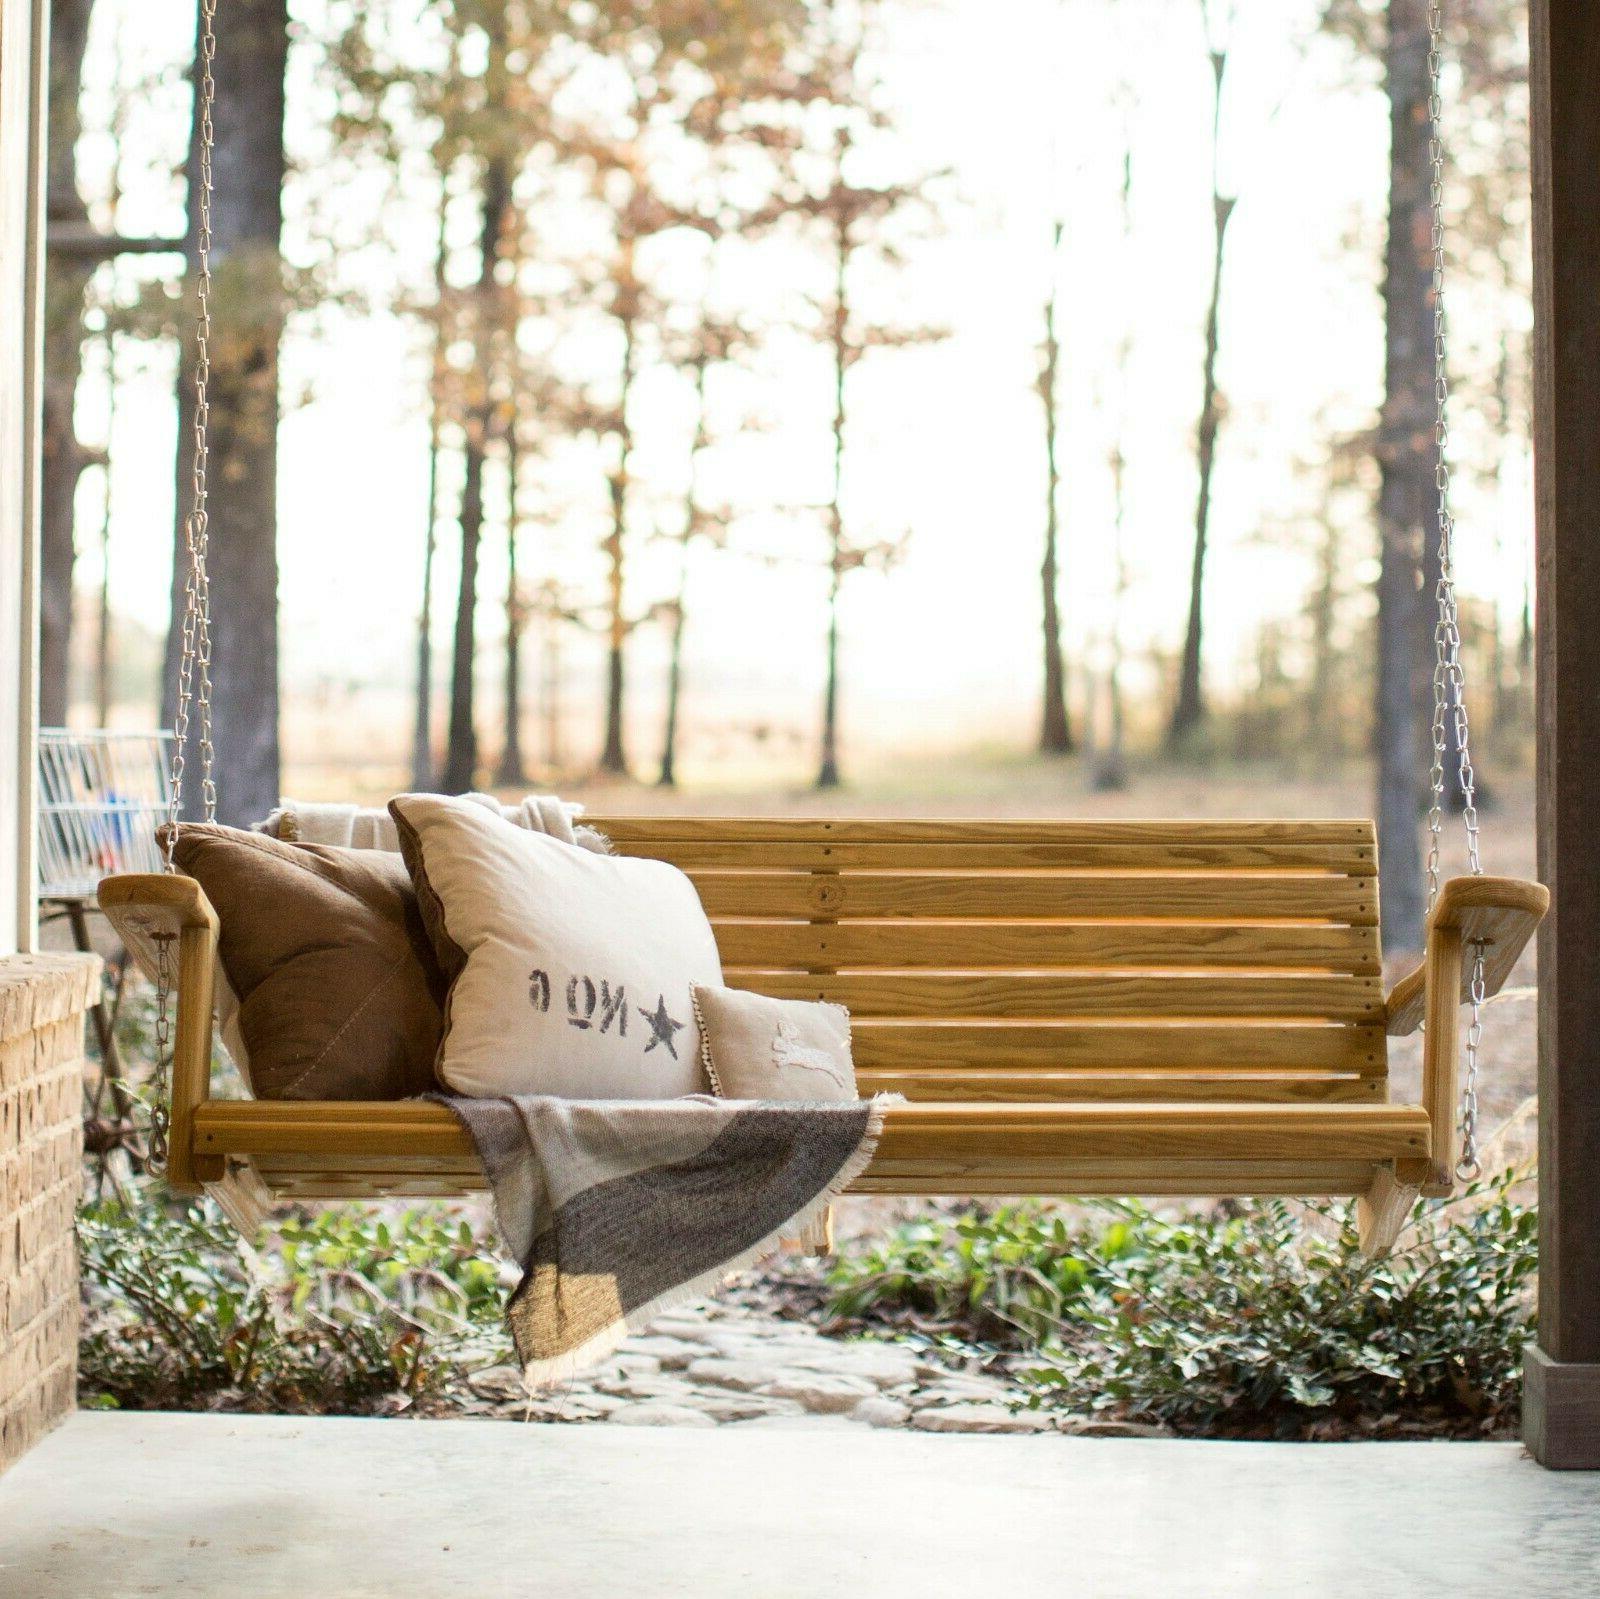 porch swing quality grg treated pine free